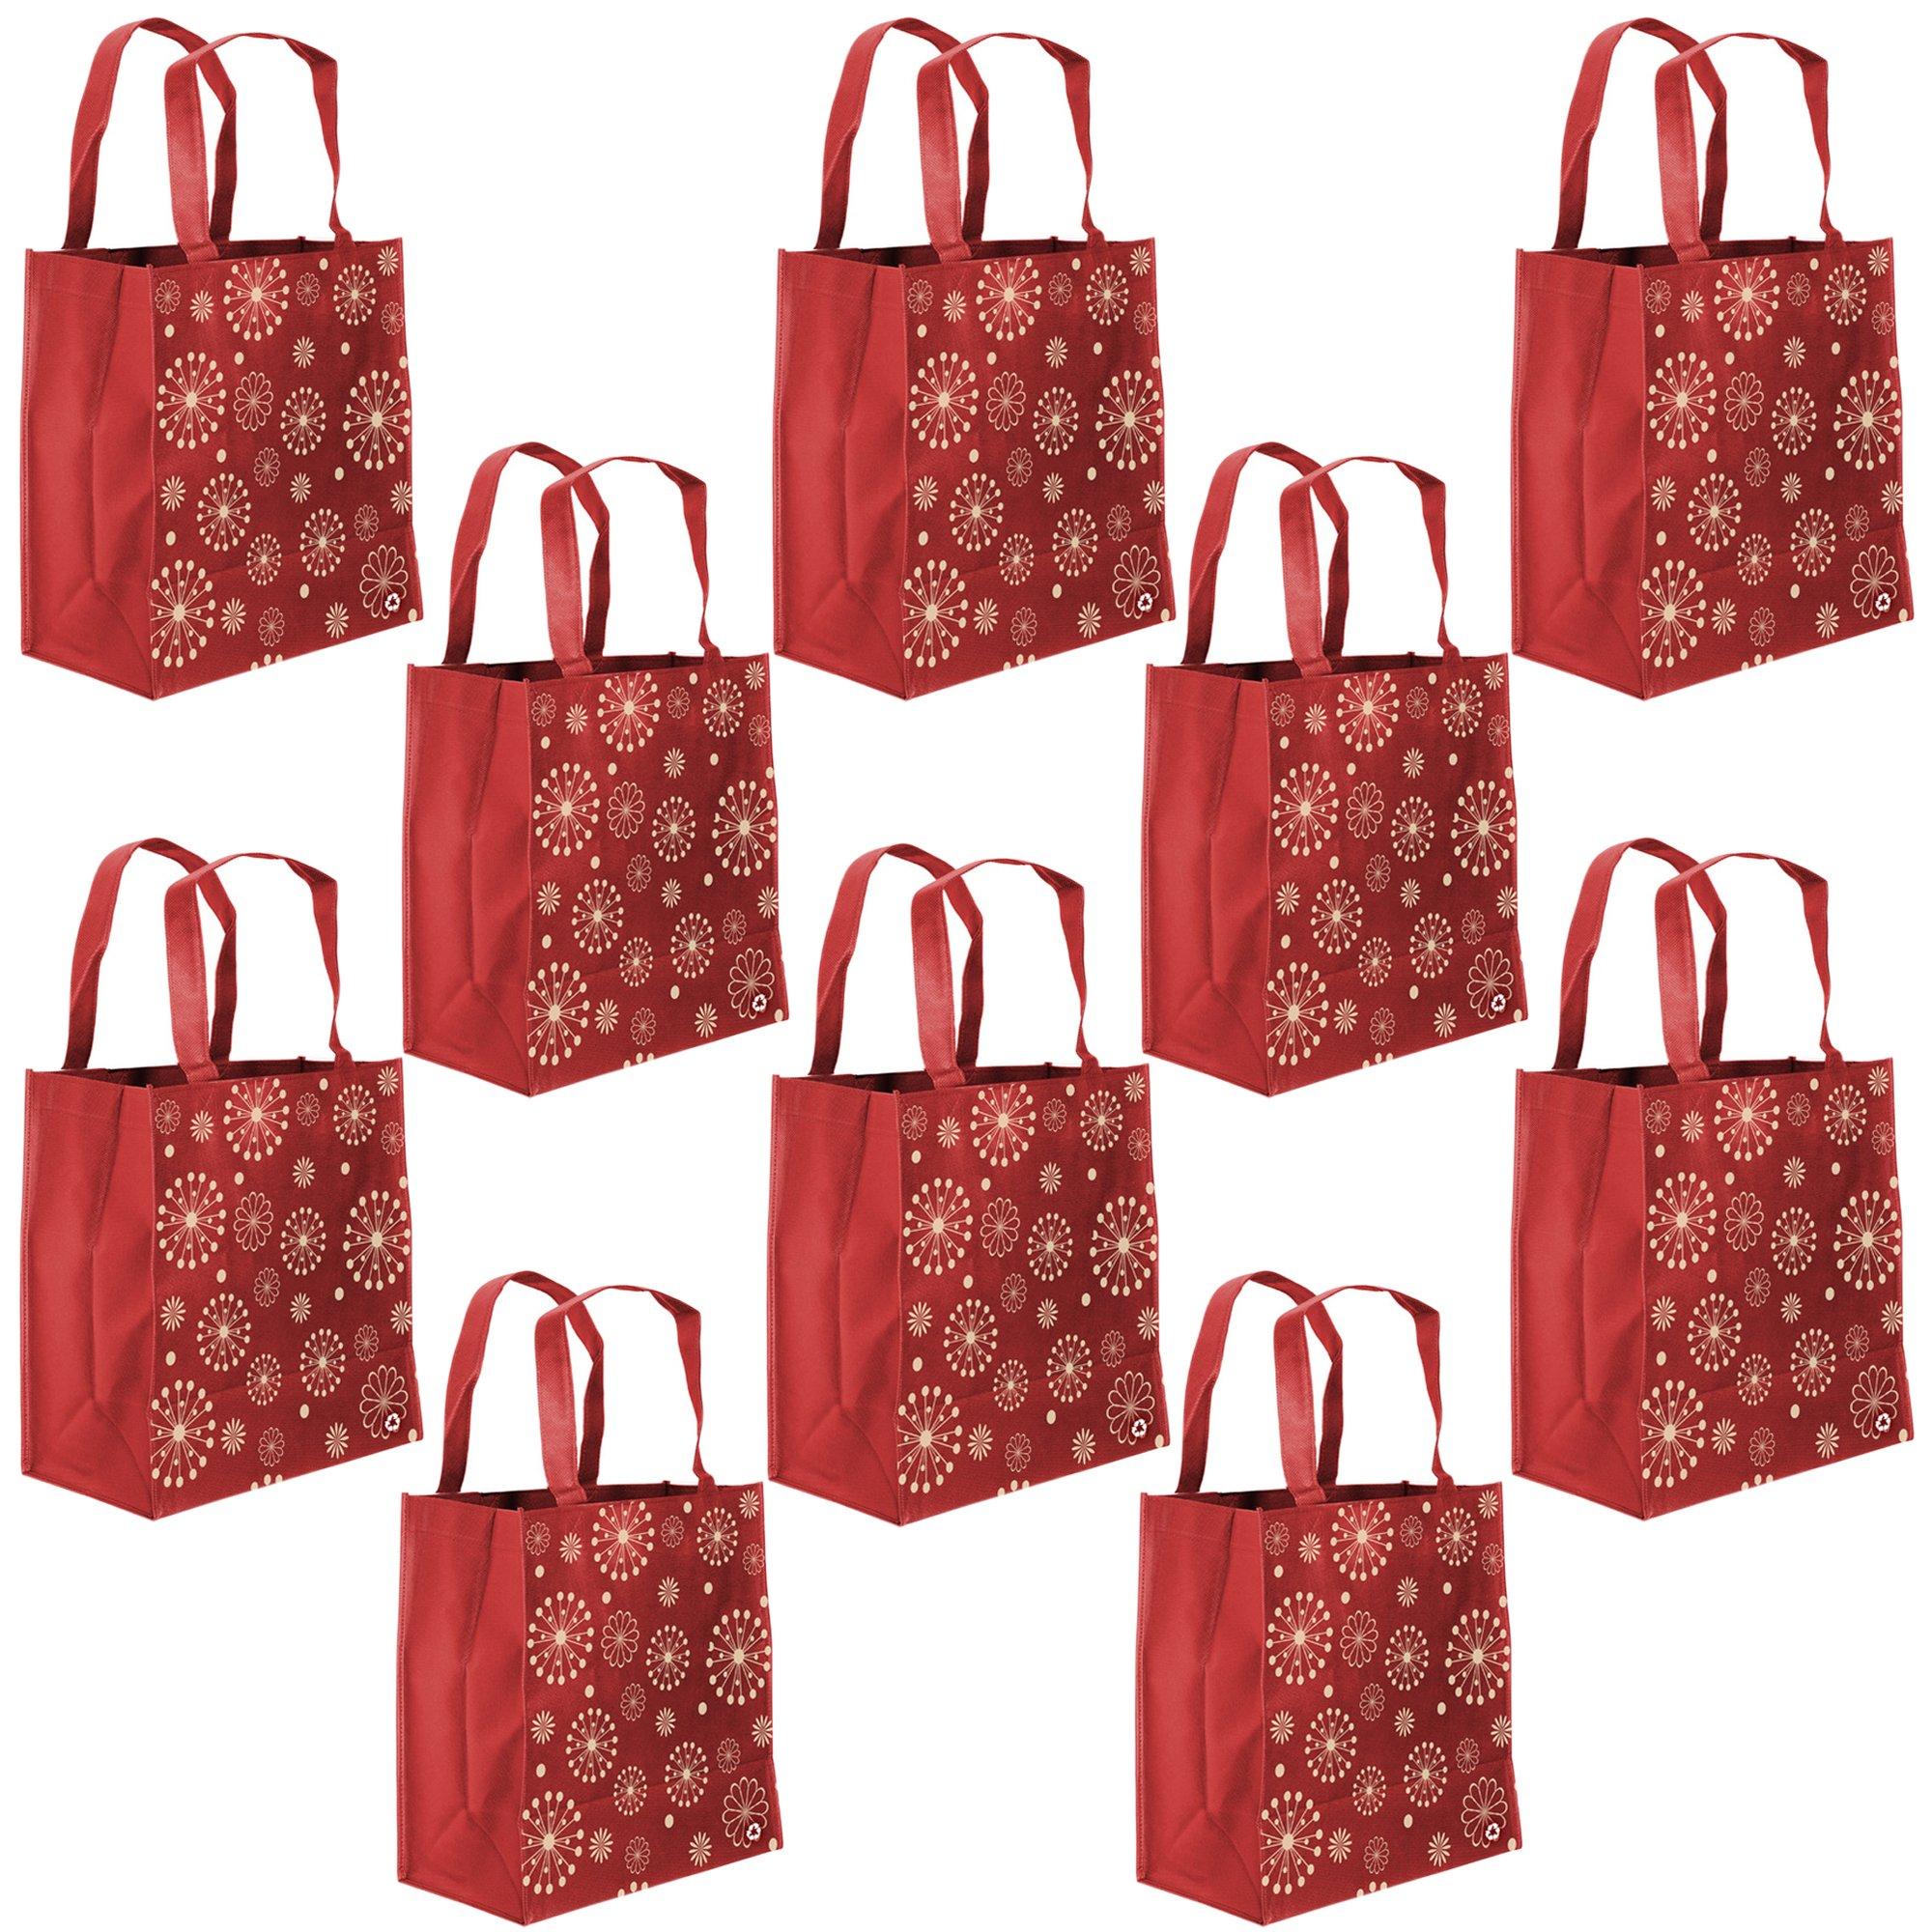 Prettyia 1 Piece Leather Bag Bottom Base Bag Shaper DIY Bag Making Accessories